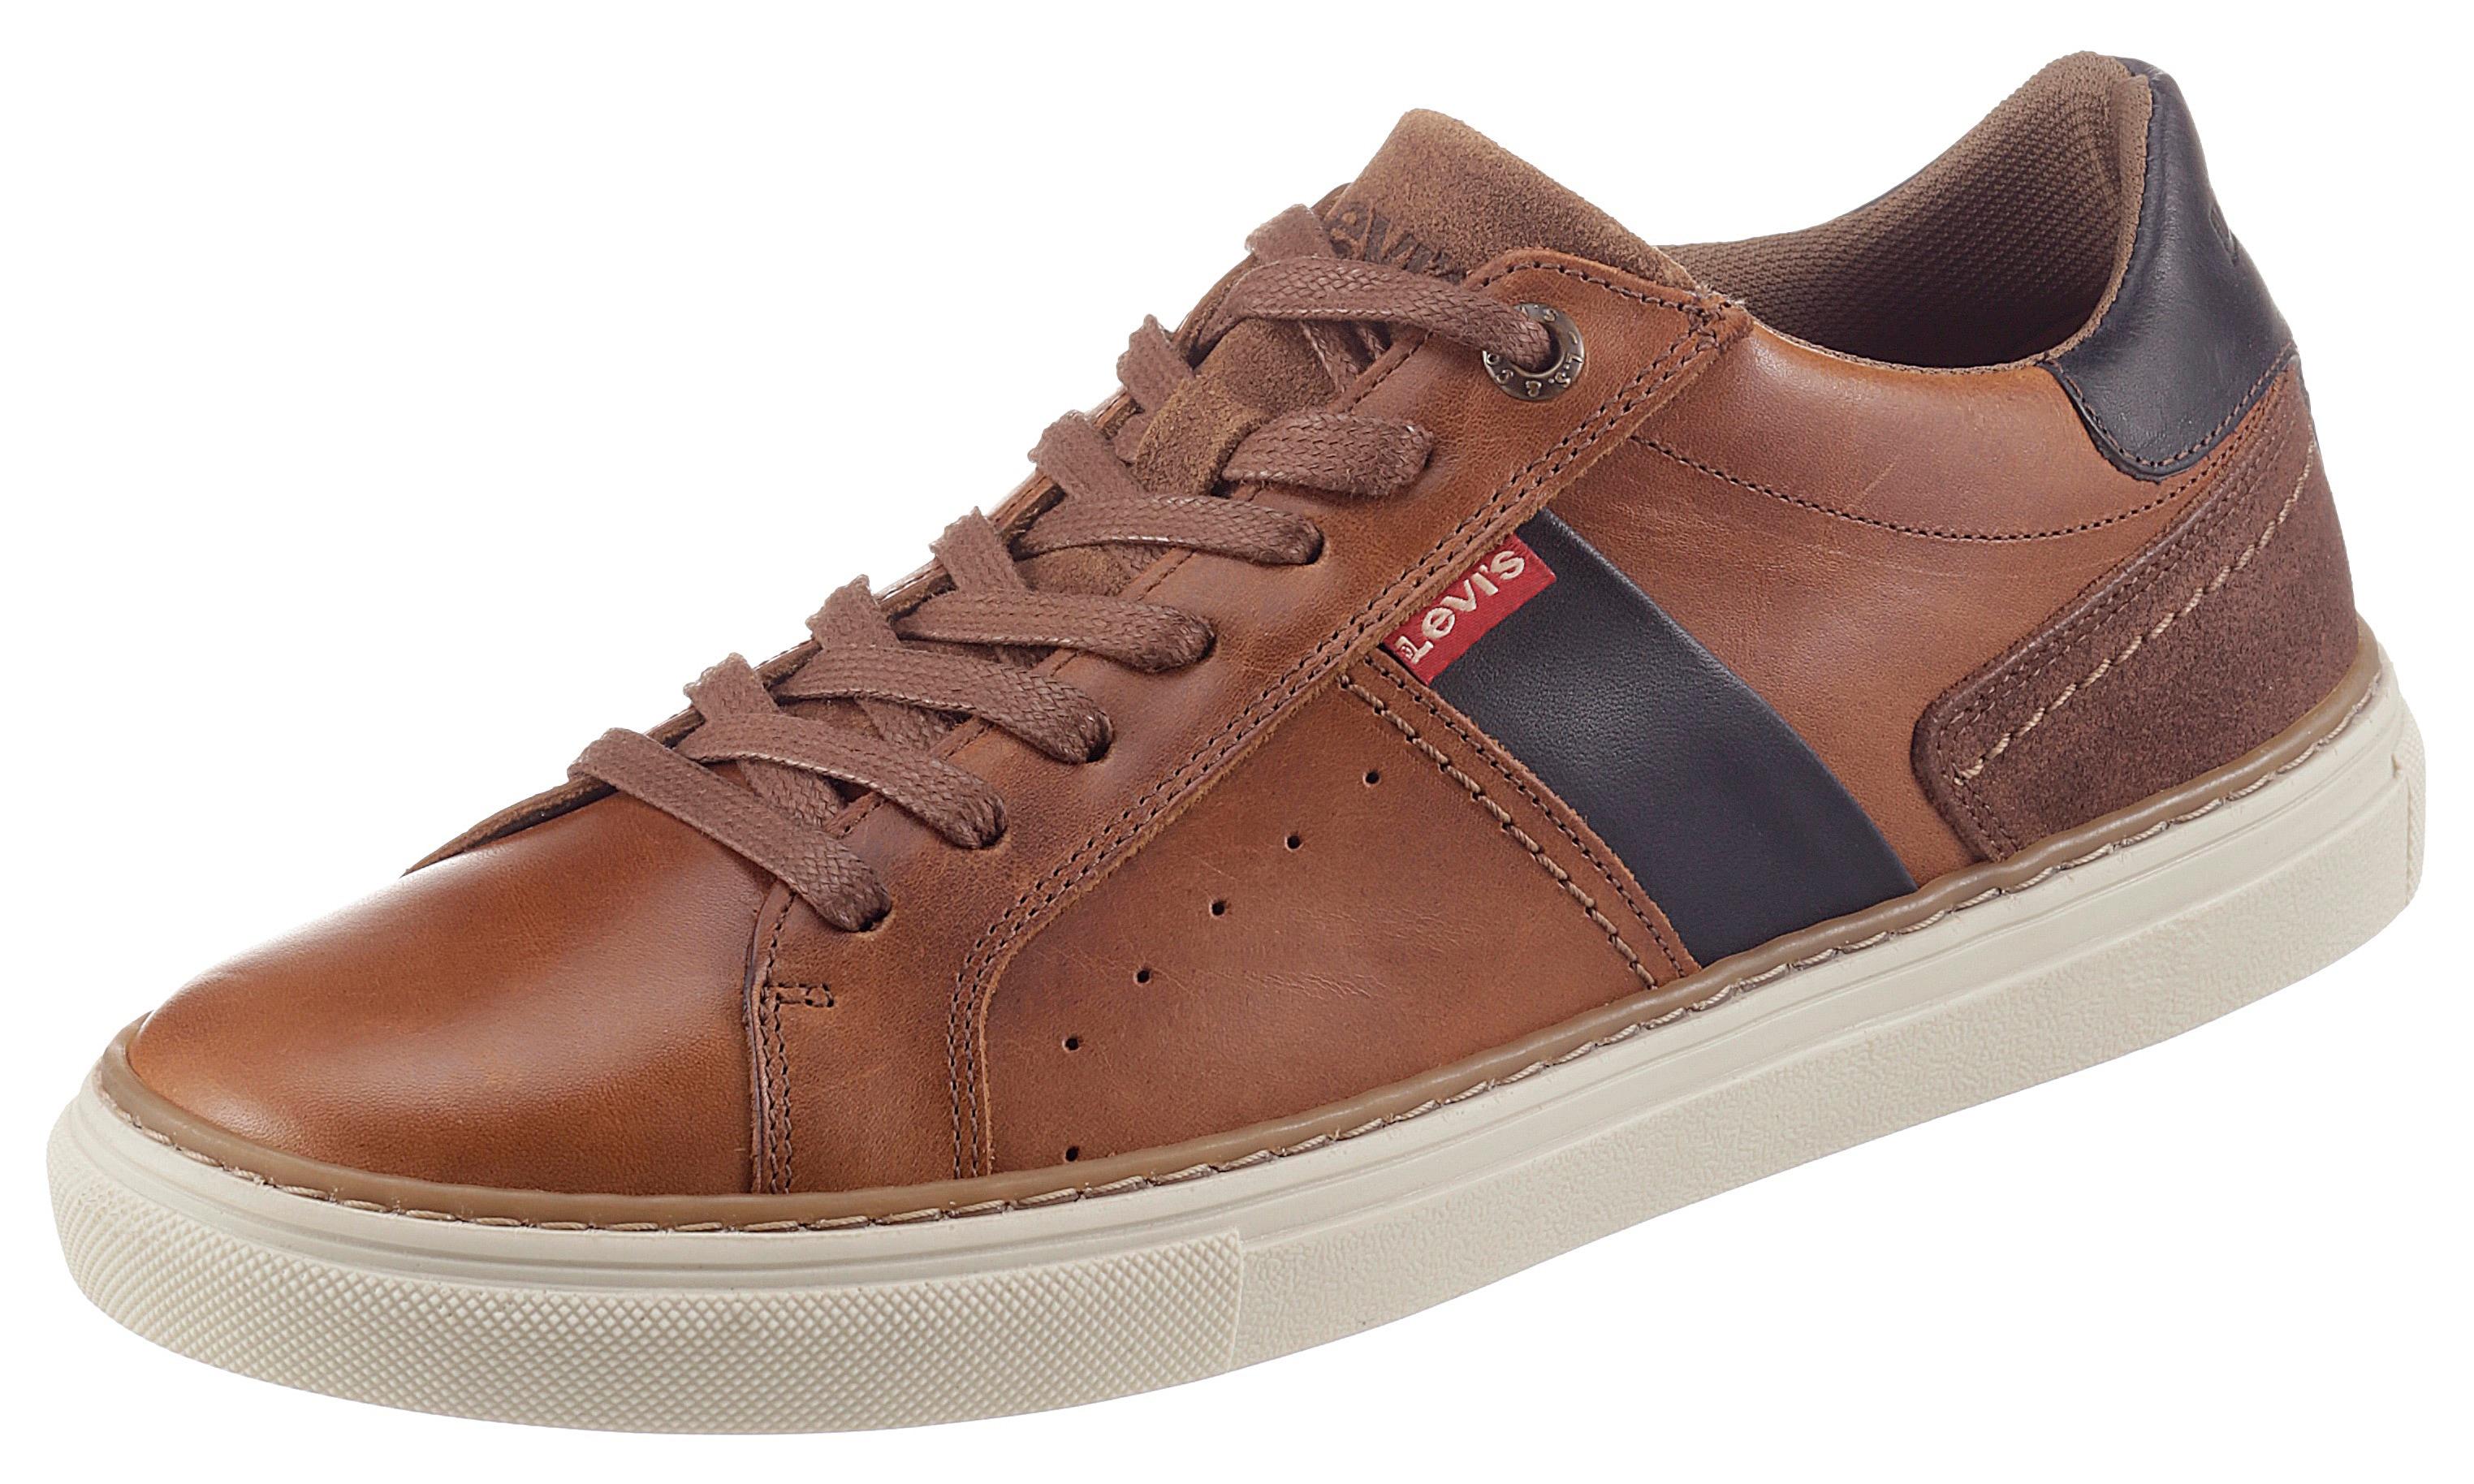 levis - Levi's Sneaker BAKER 2.0, im Materialmix